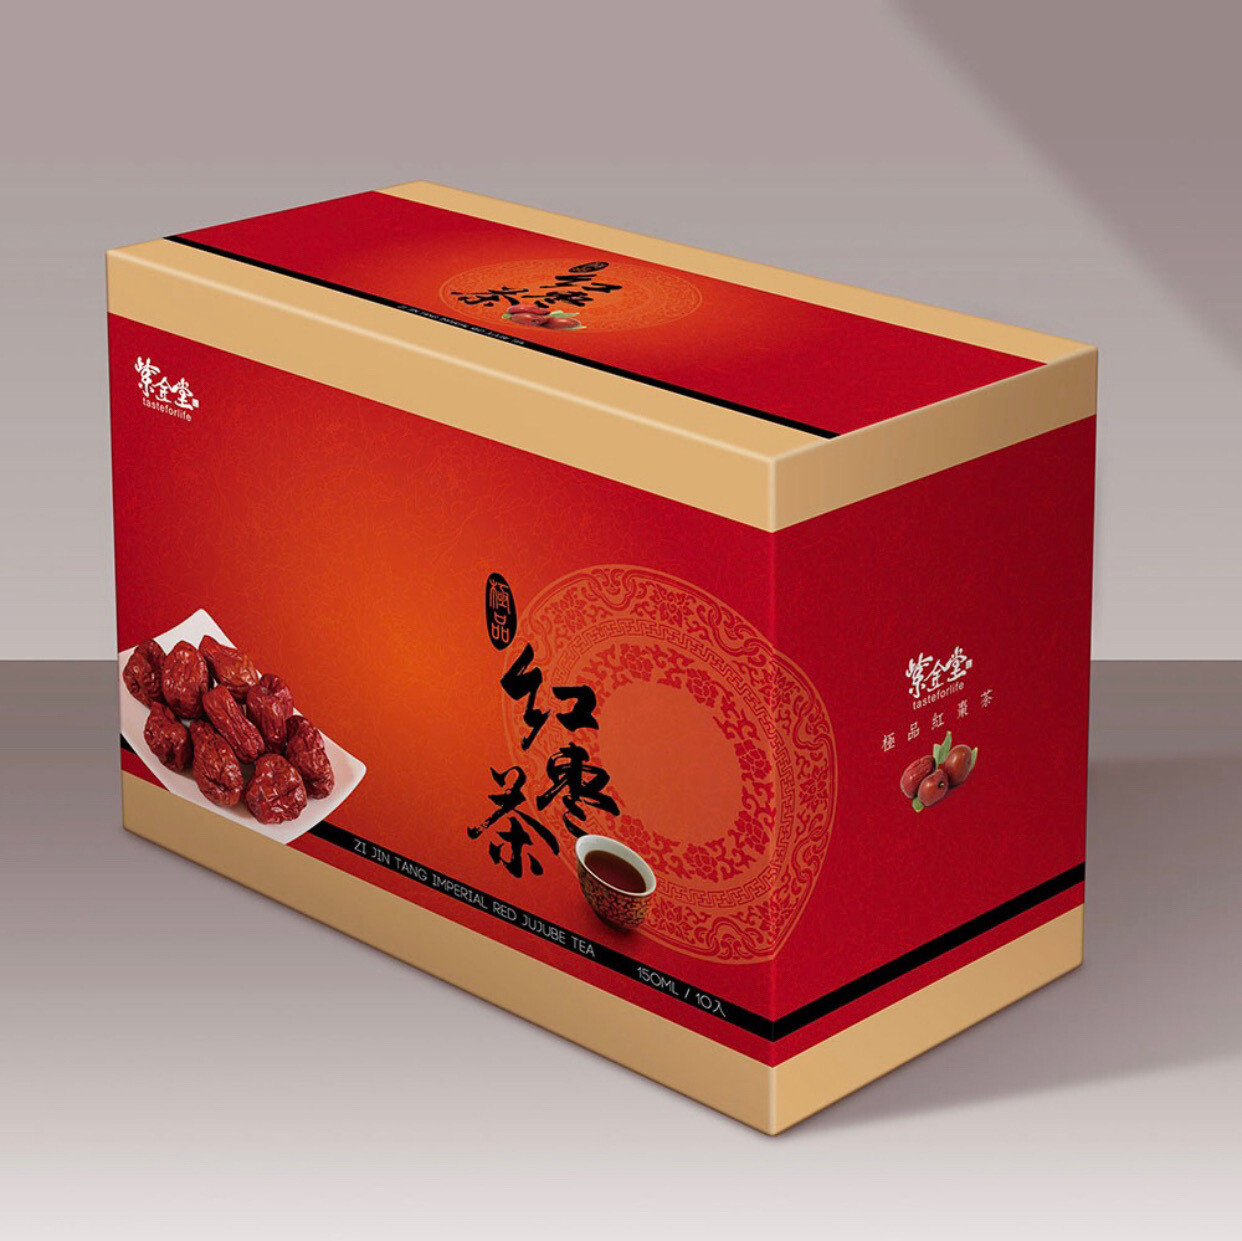 Imperial Red Jujube Tea 极品红枣茶